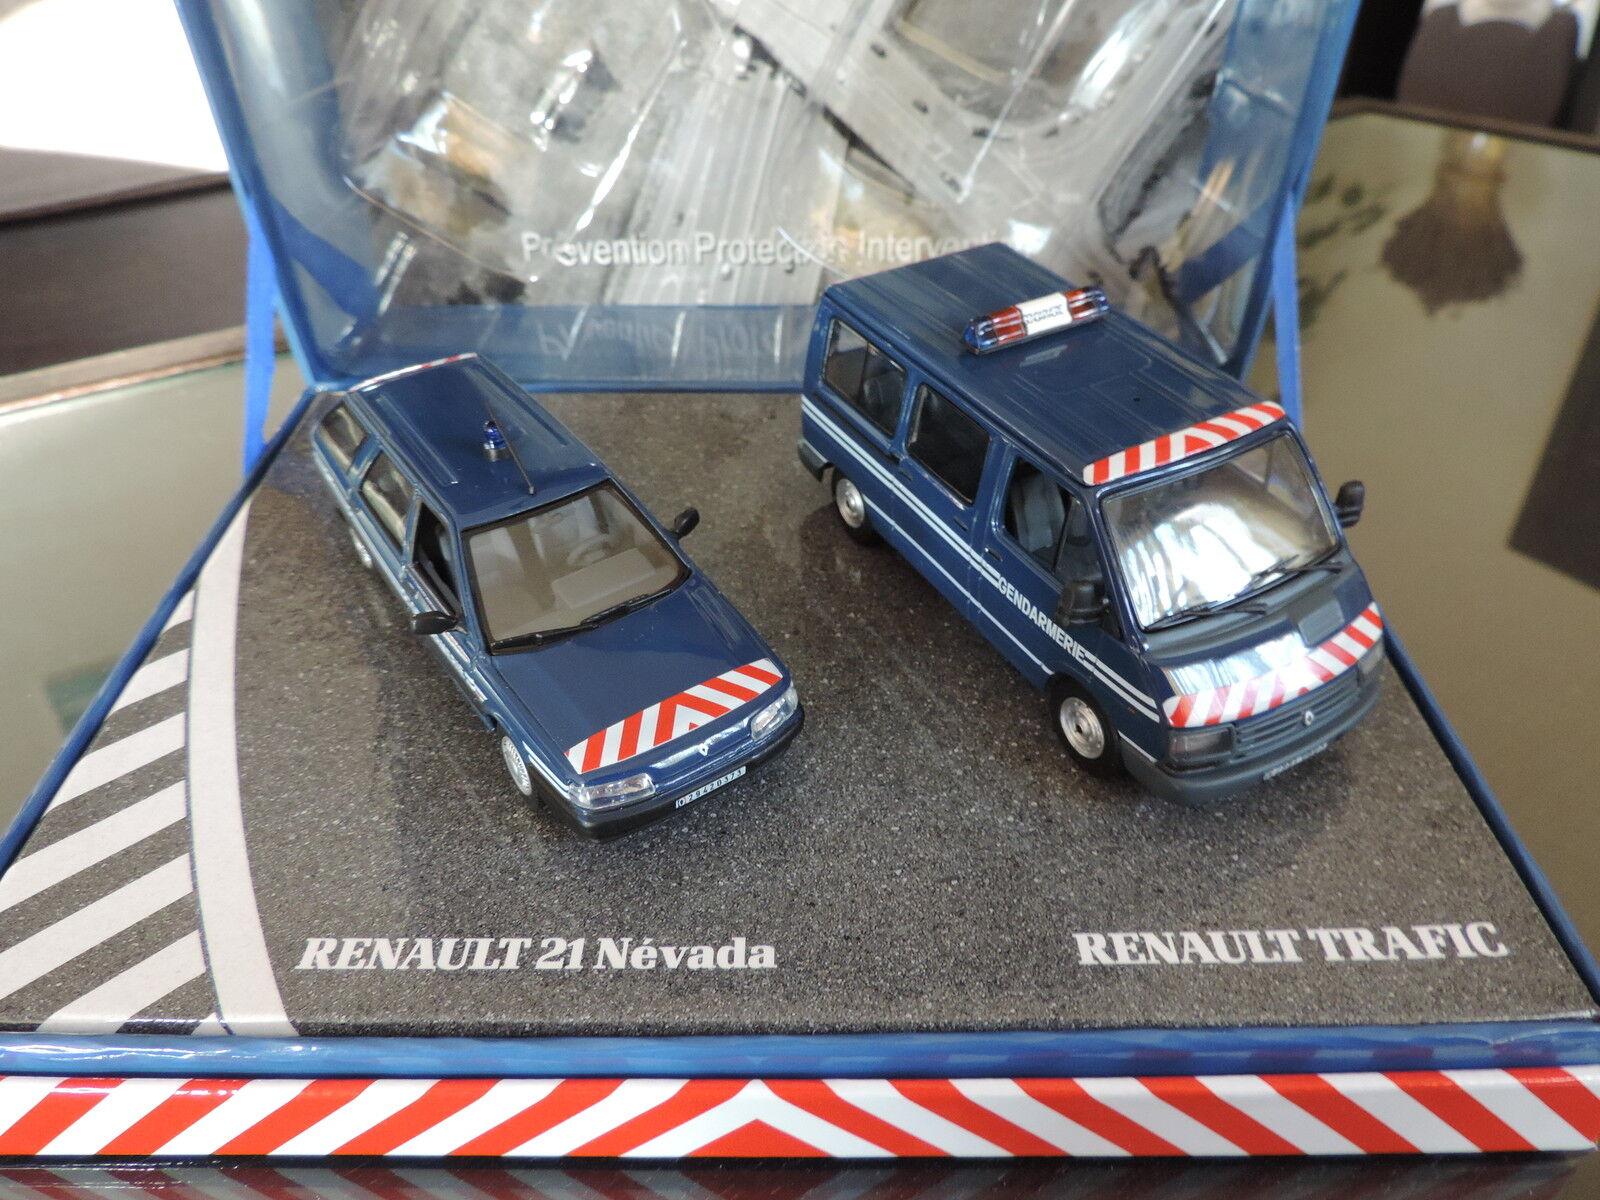 Coffret Gendarmerie Renault Trafic + Renault 21 Nevada 1 43 Norev Traffic R21